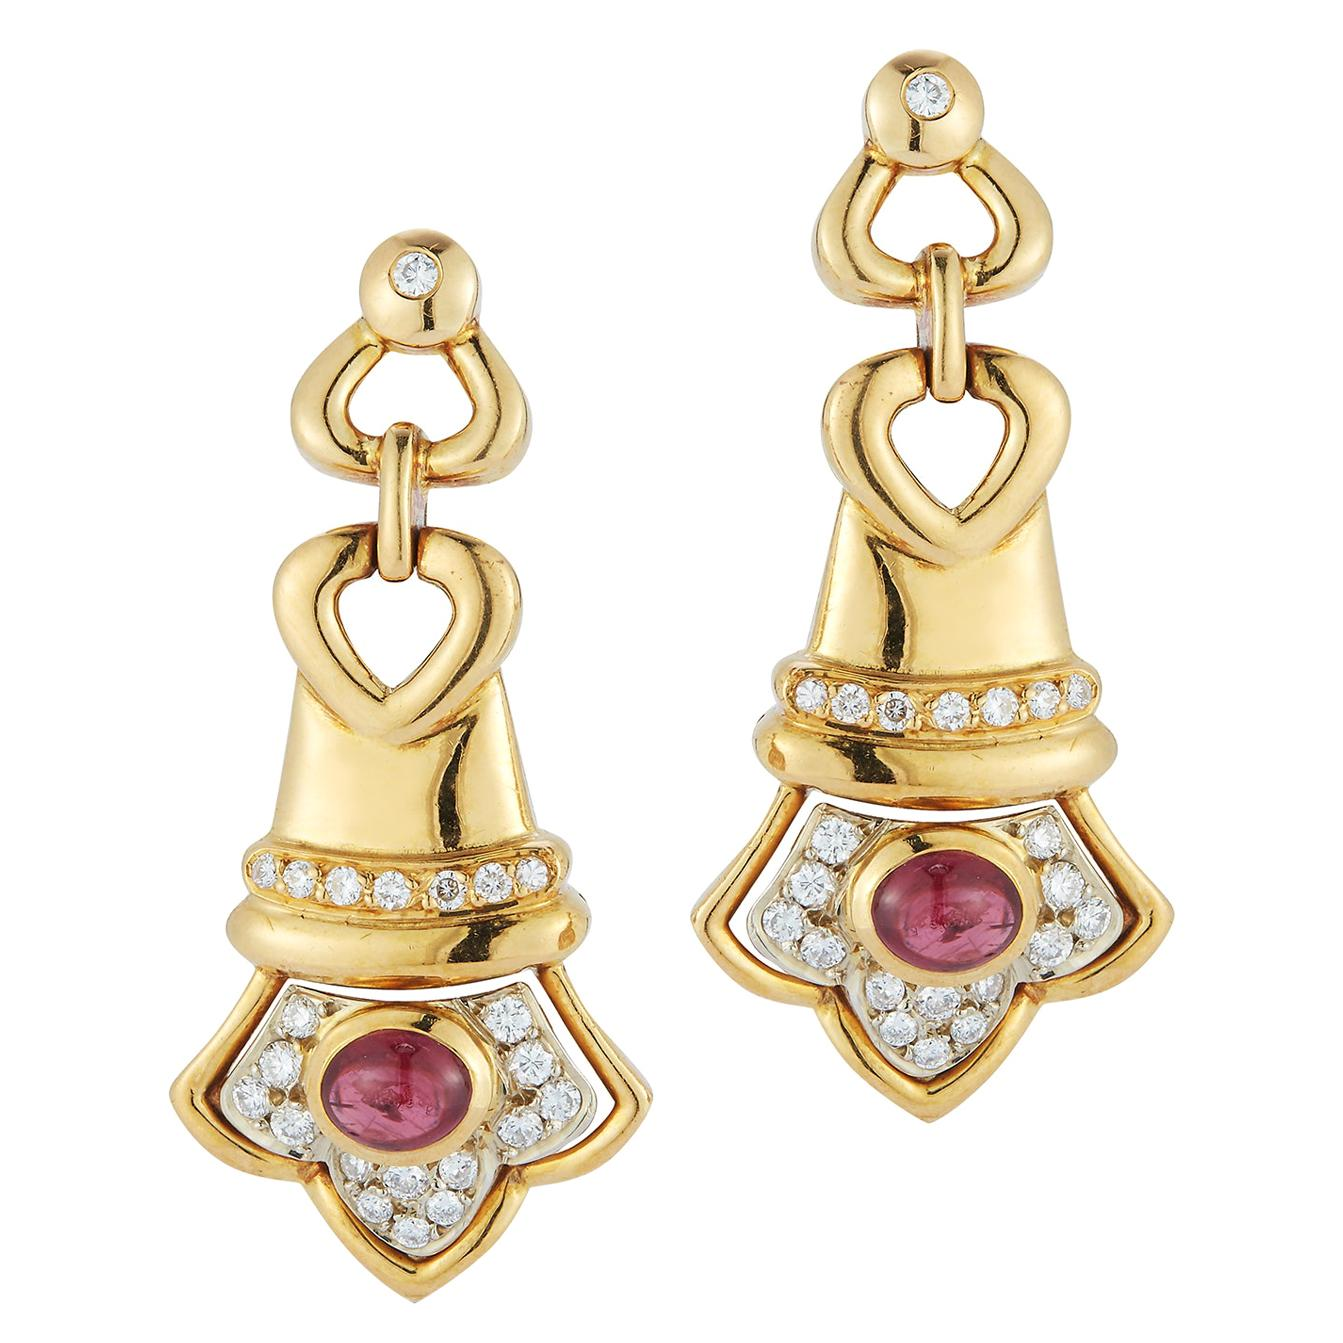 Cabochon Ruby & Diamond Earrings